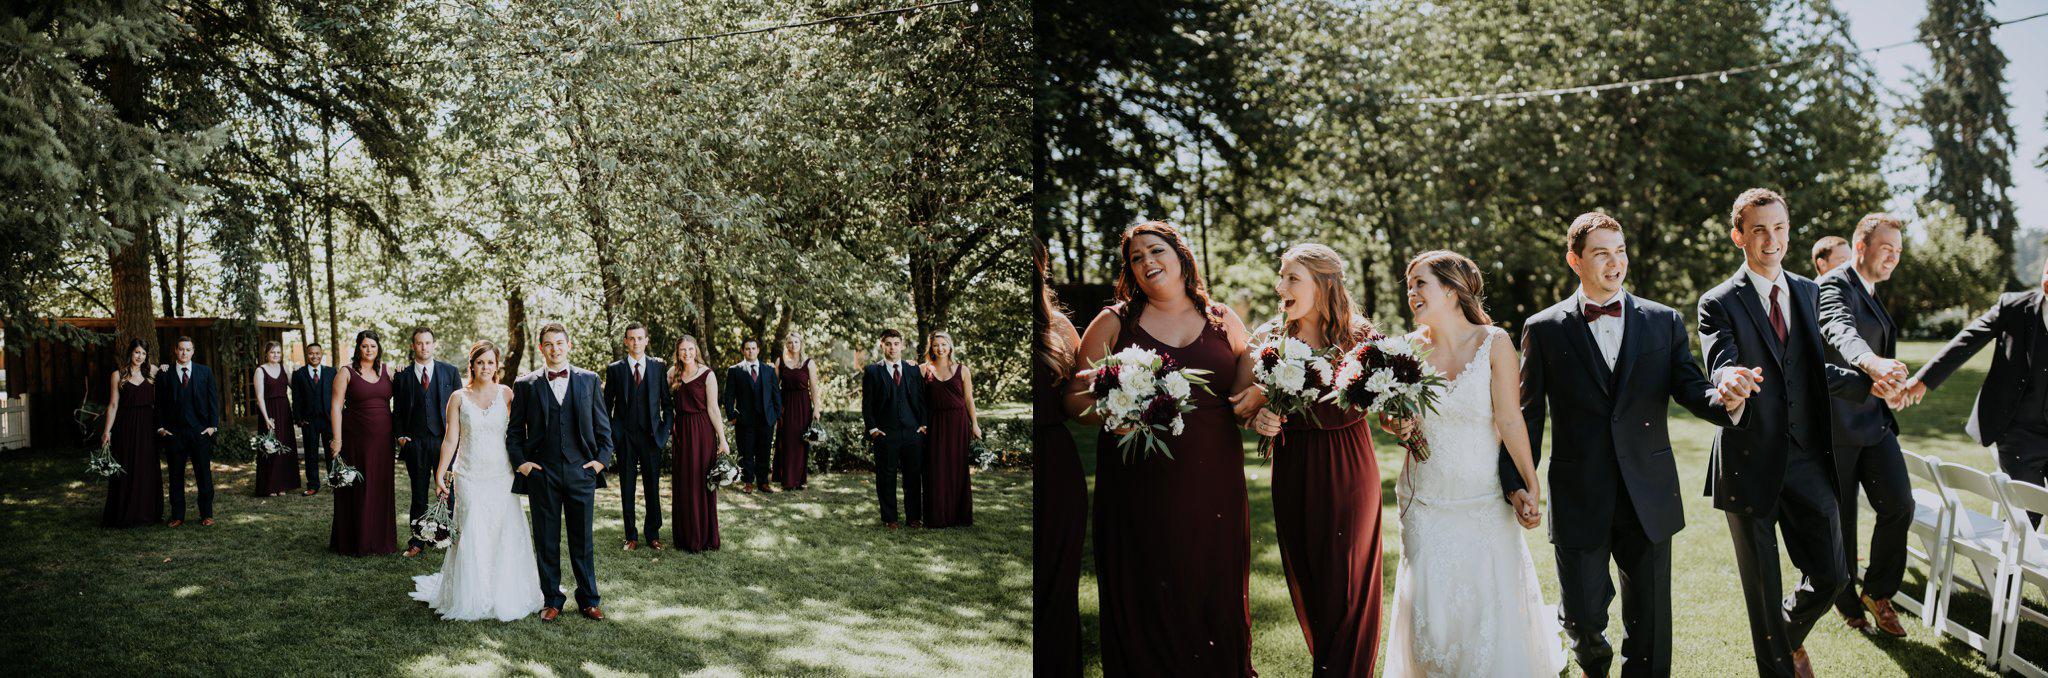 kristen-and-cody-the-kelley-farm-wedding-seattle-photographer-caitlyn-nikula-42.jpg